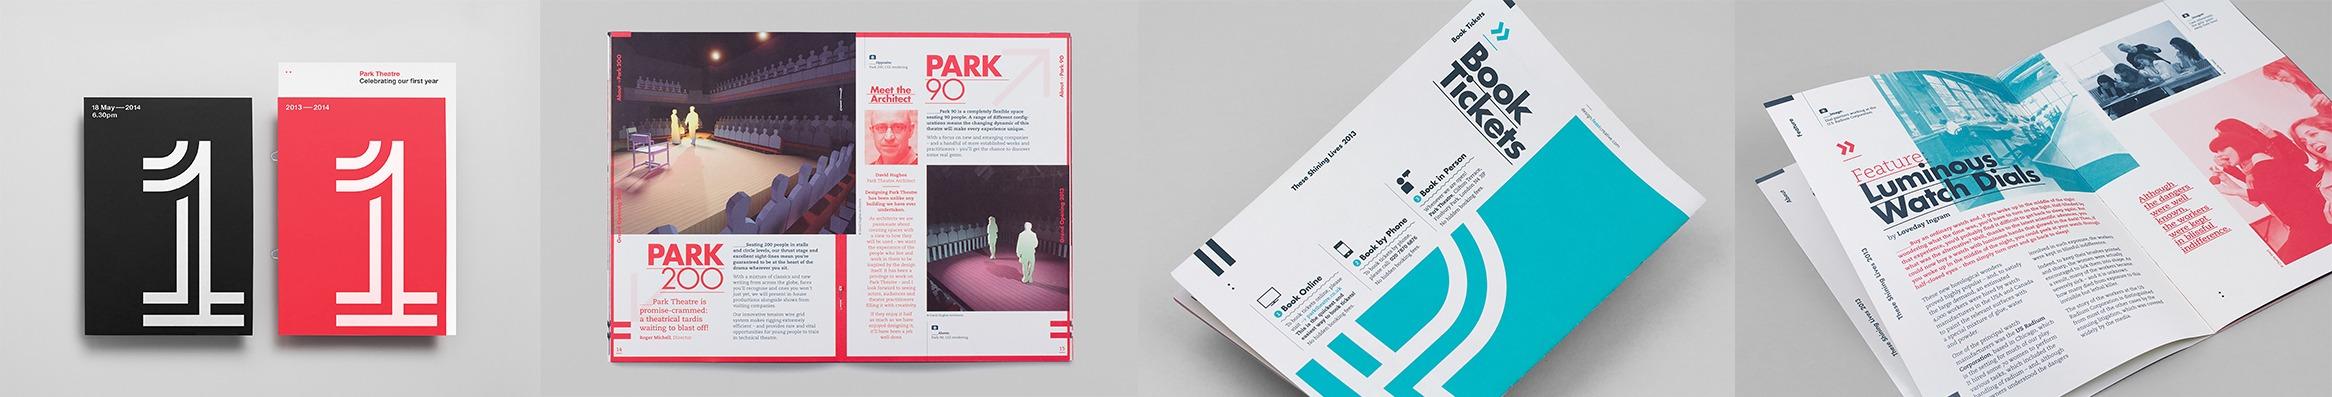 Park-PrintBits